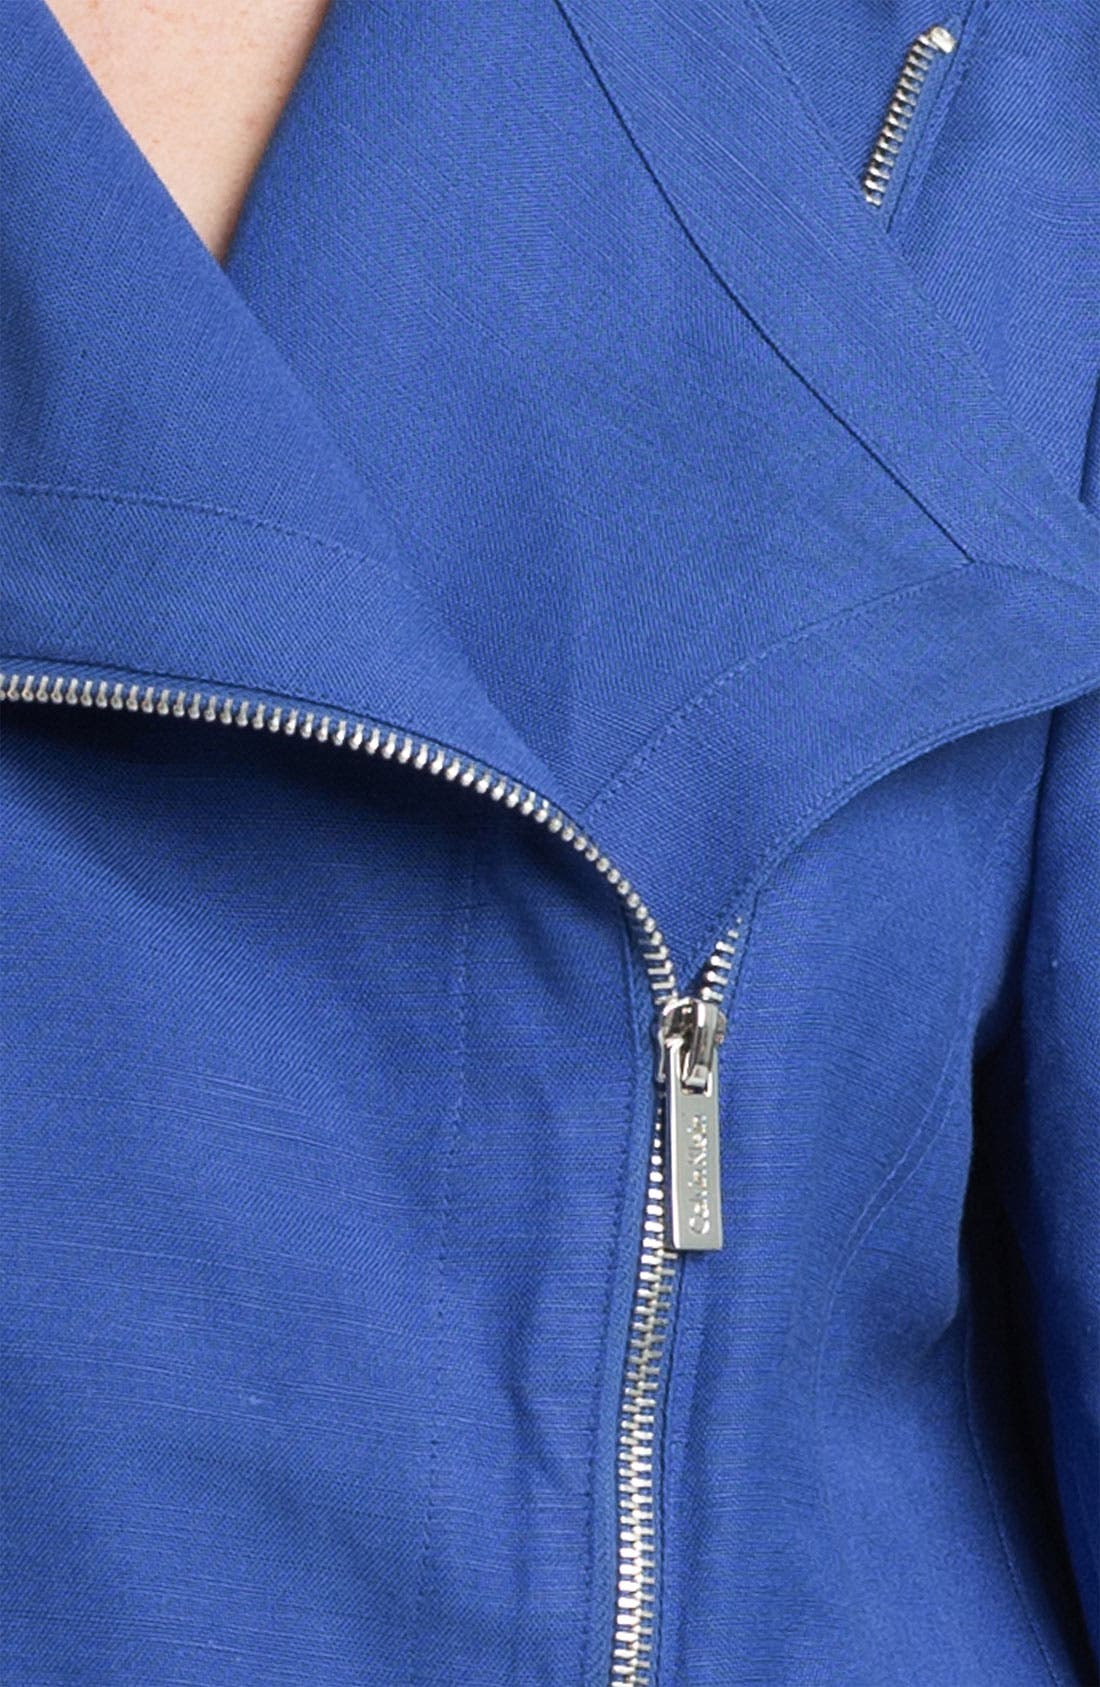 Alternate Image 3  - Calvin Klein Linen Blend Moto Jacket (Online Exclusive)